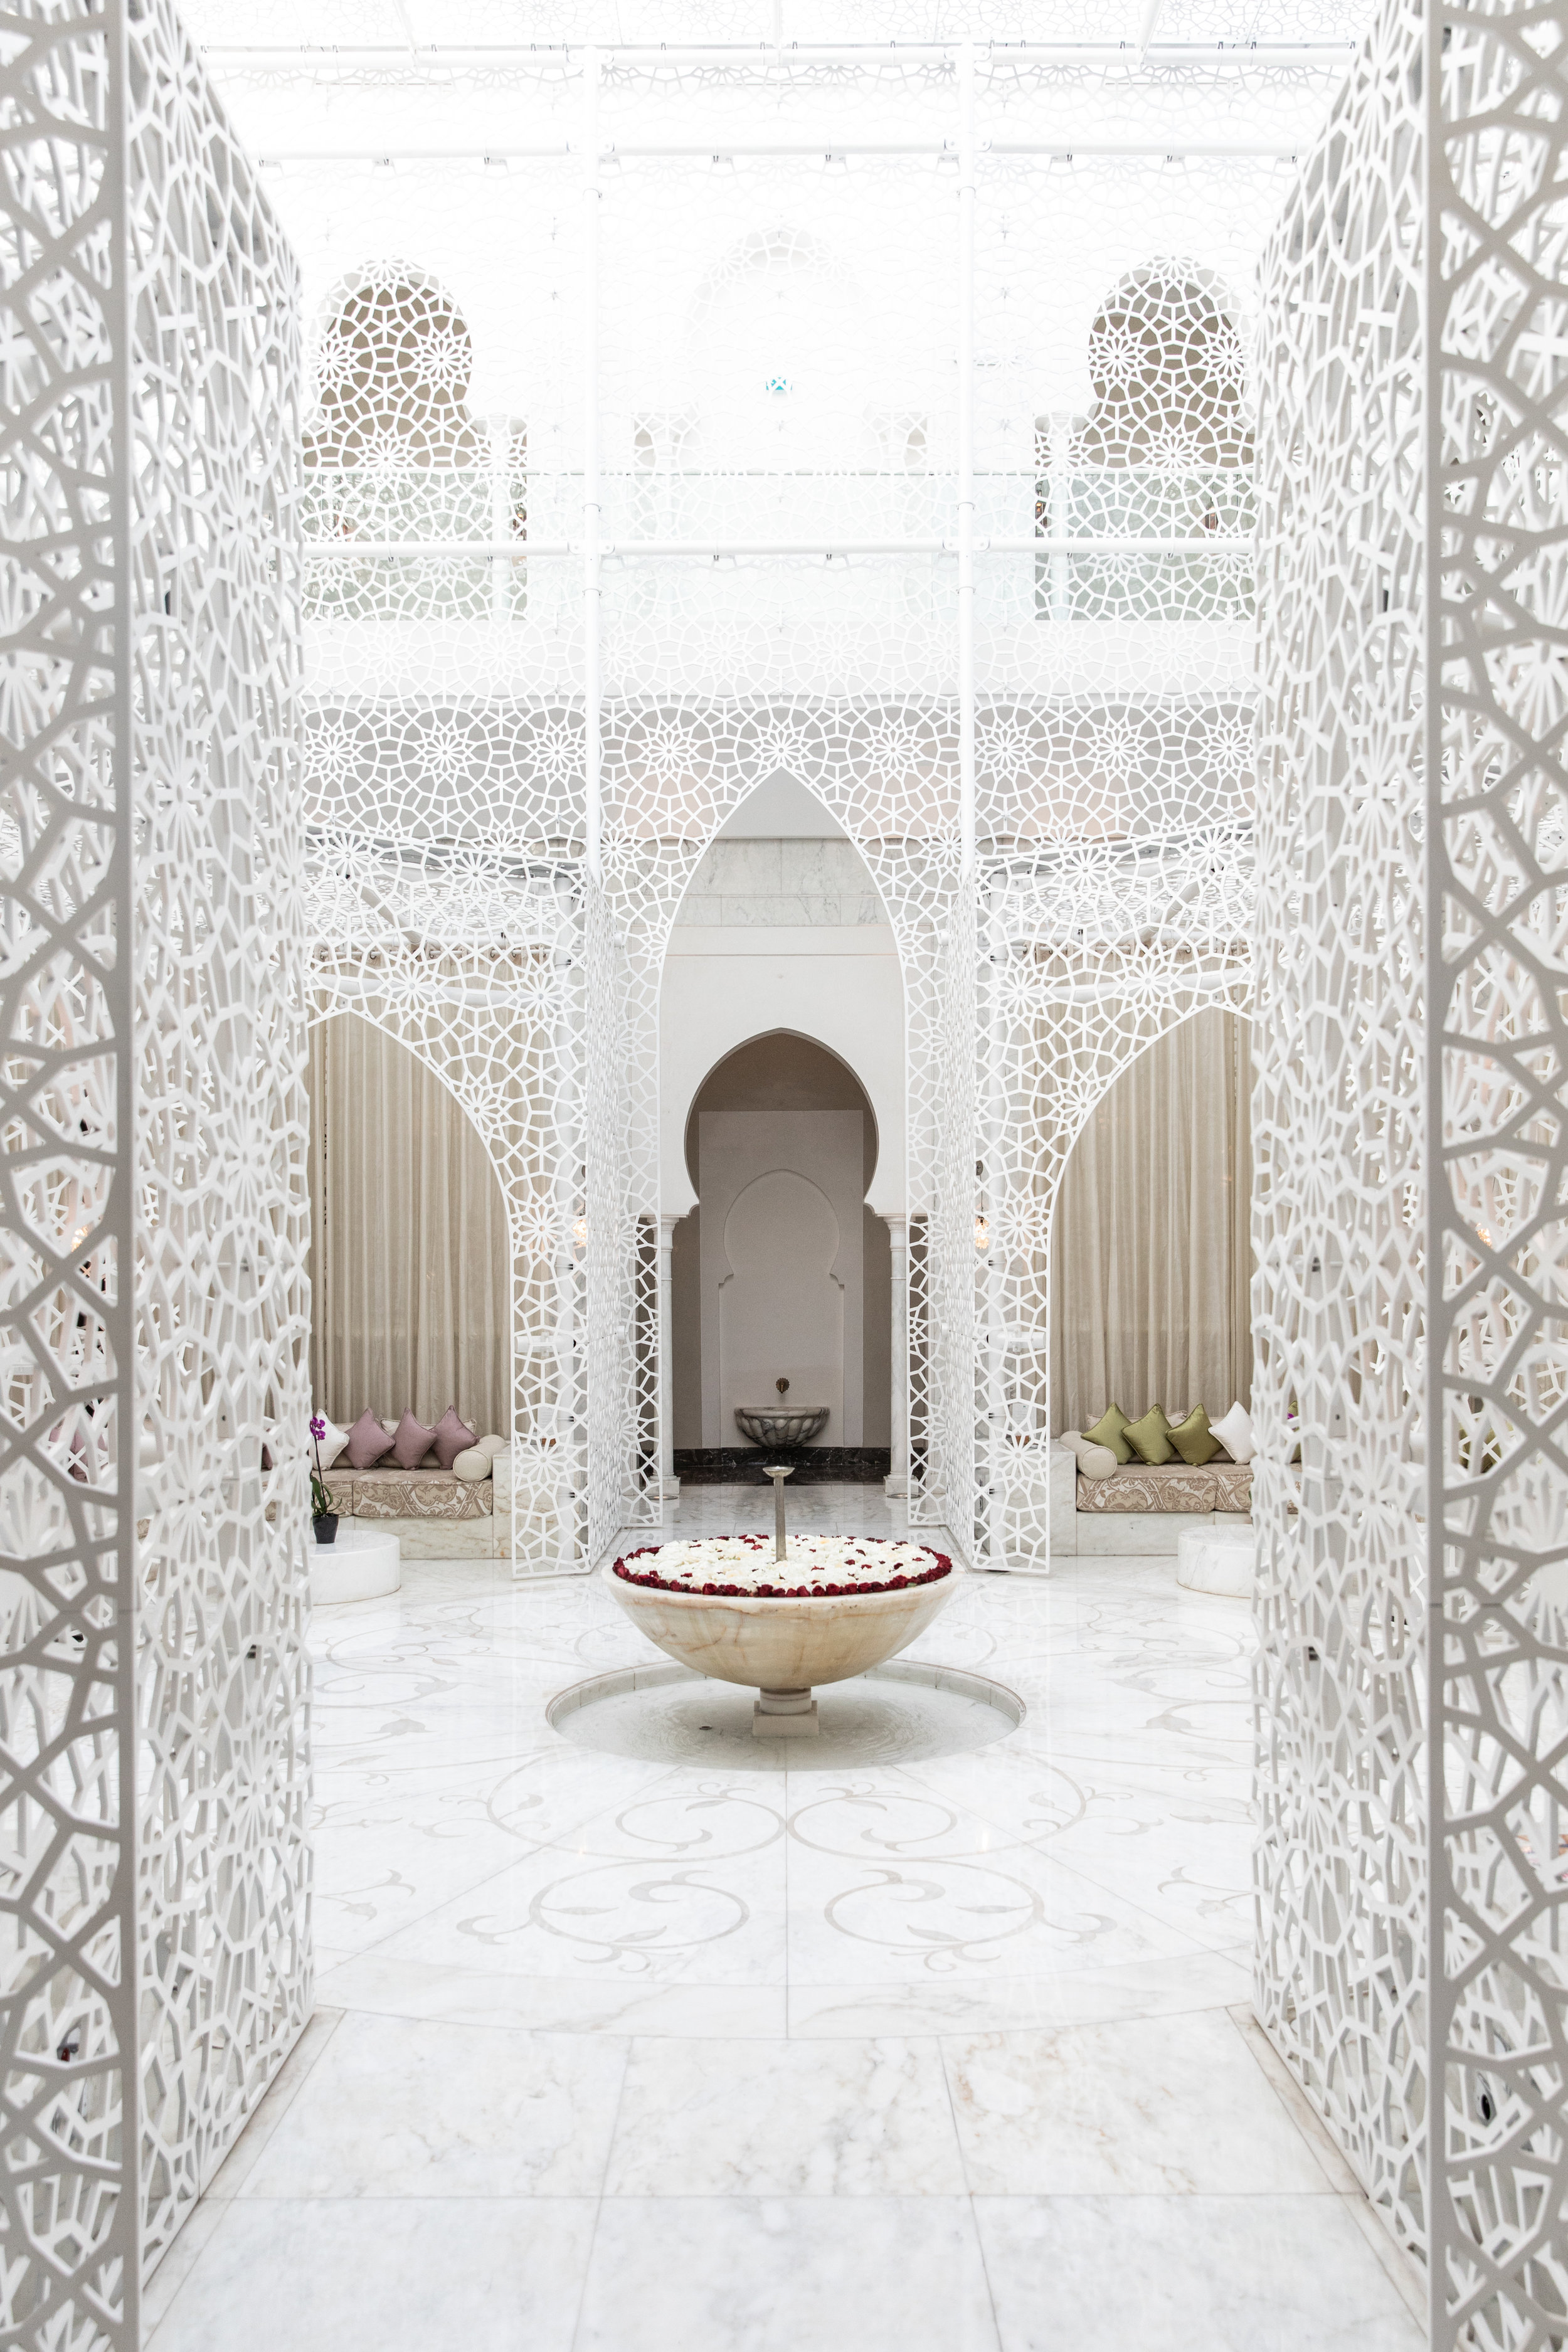 Morocco-3650.jpg